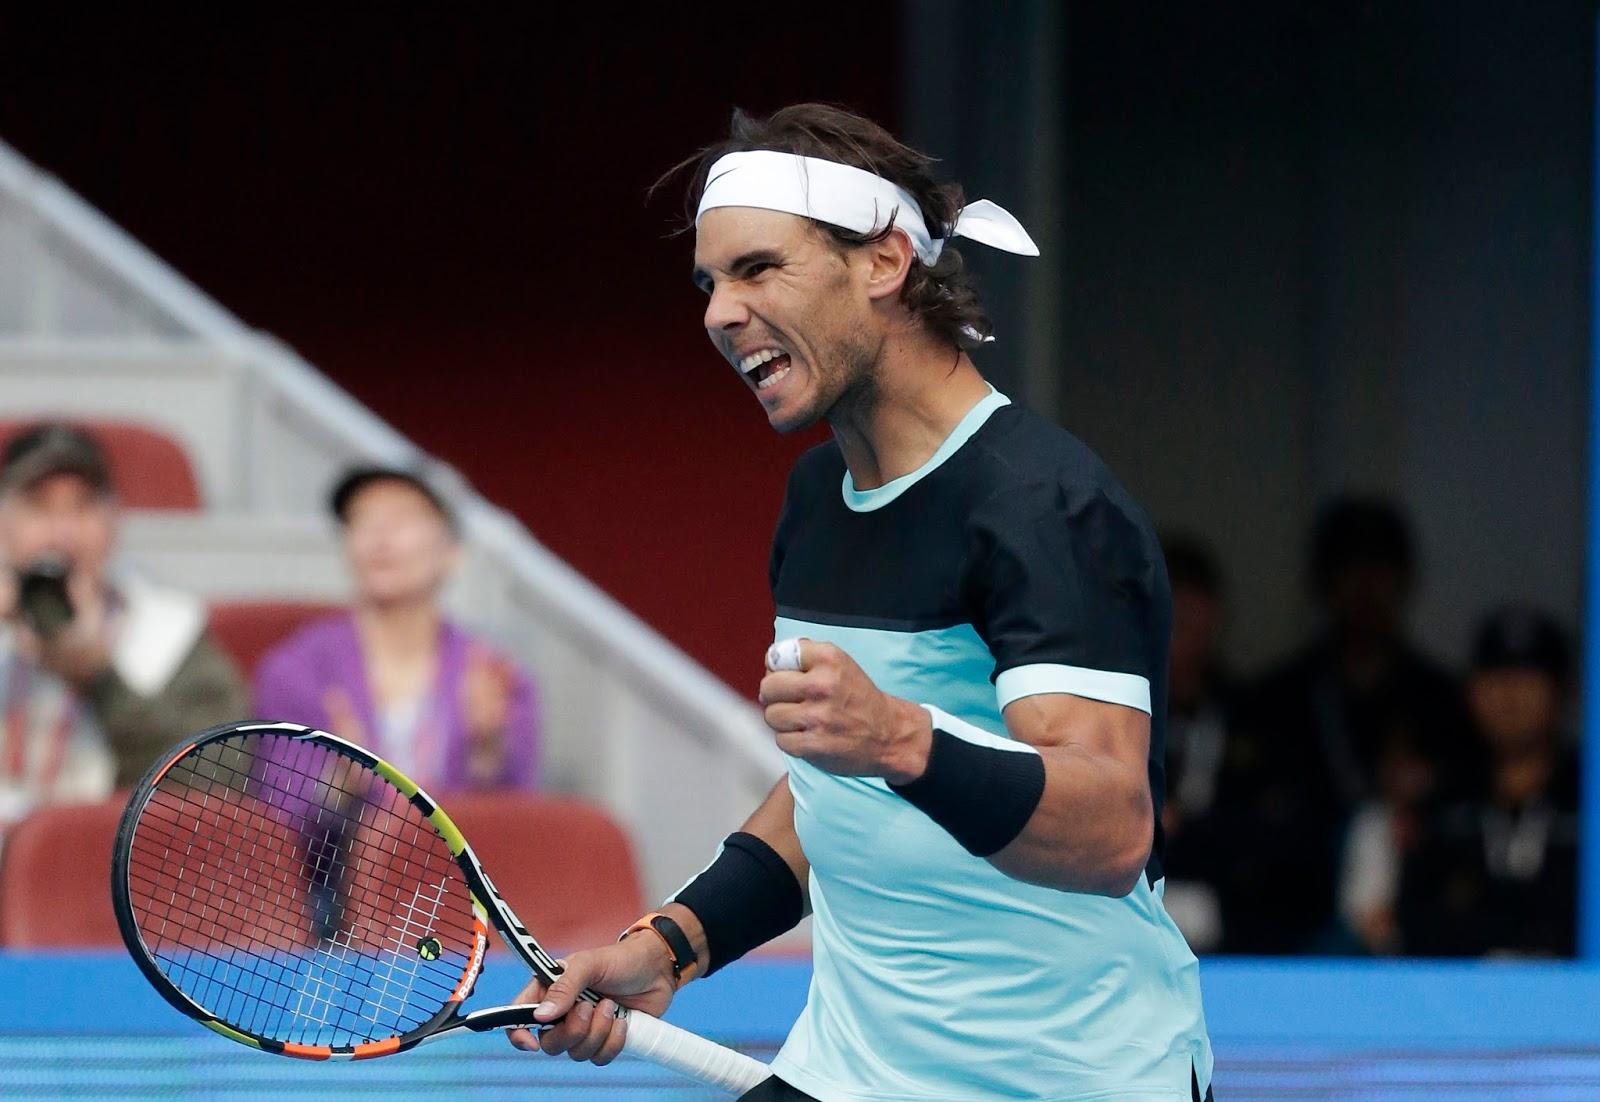 AP/Andy Wong